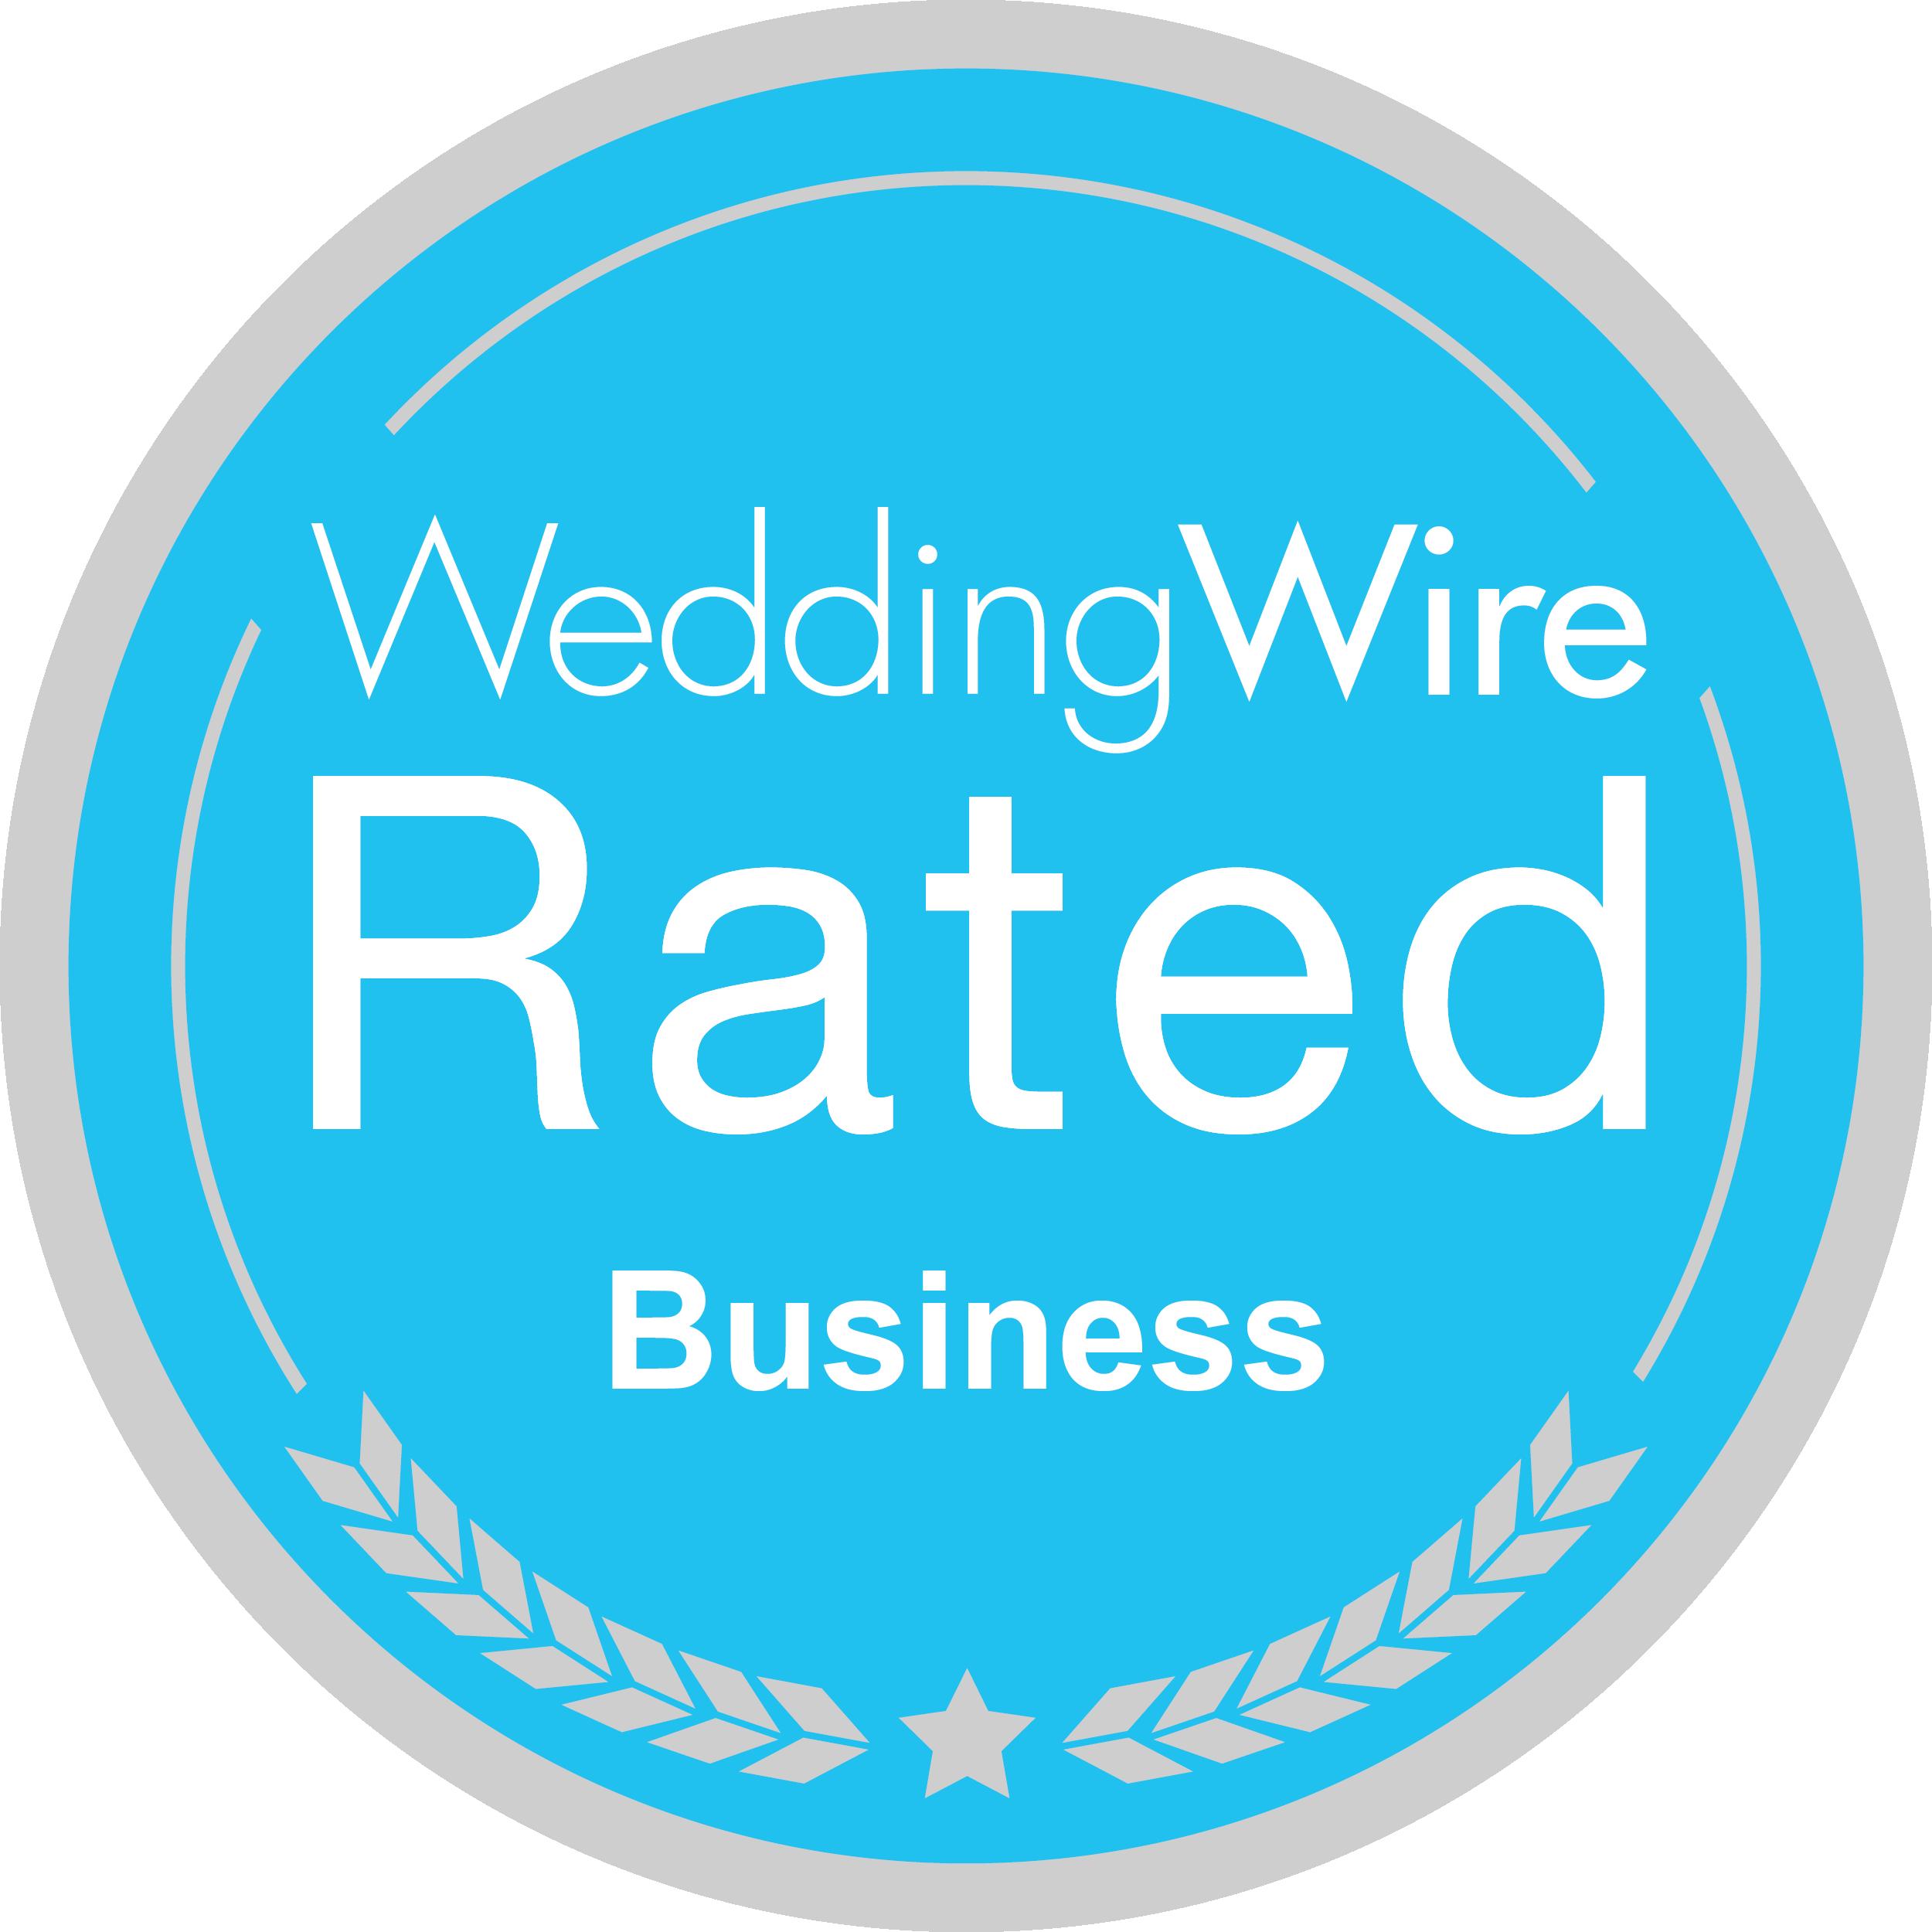 WeddingWire members